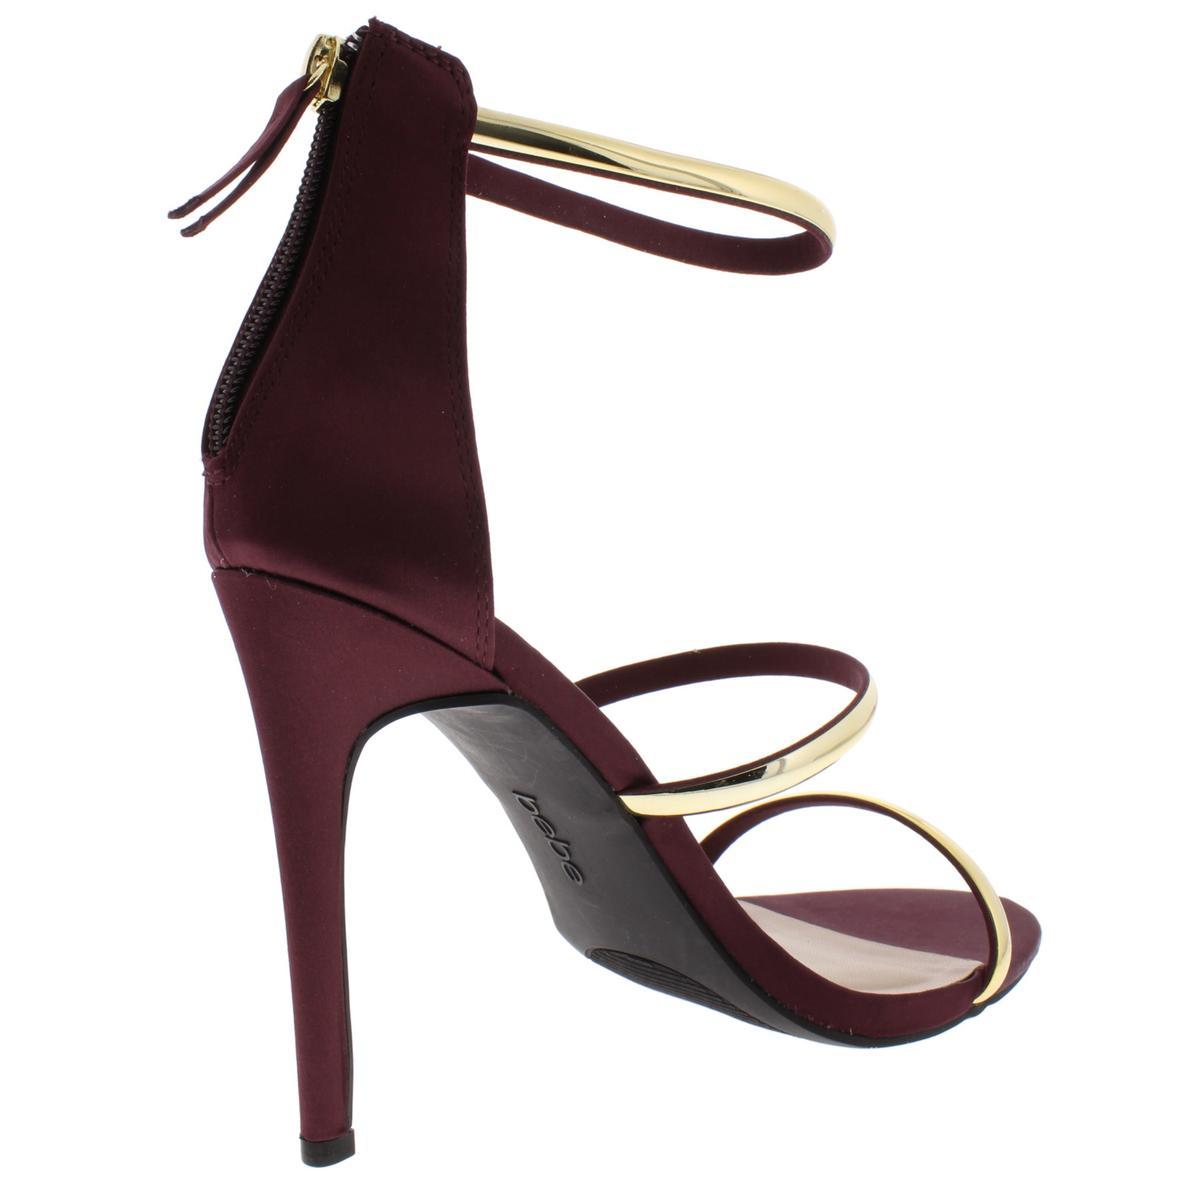 Bebe-Womens-Berdine-Strappy-Textured-Ankle-Strap-Dress-Sandals-Heels-BHFO-6118 thumbnail 8